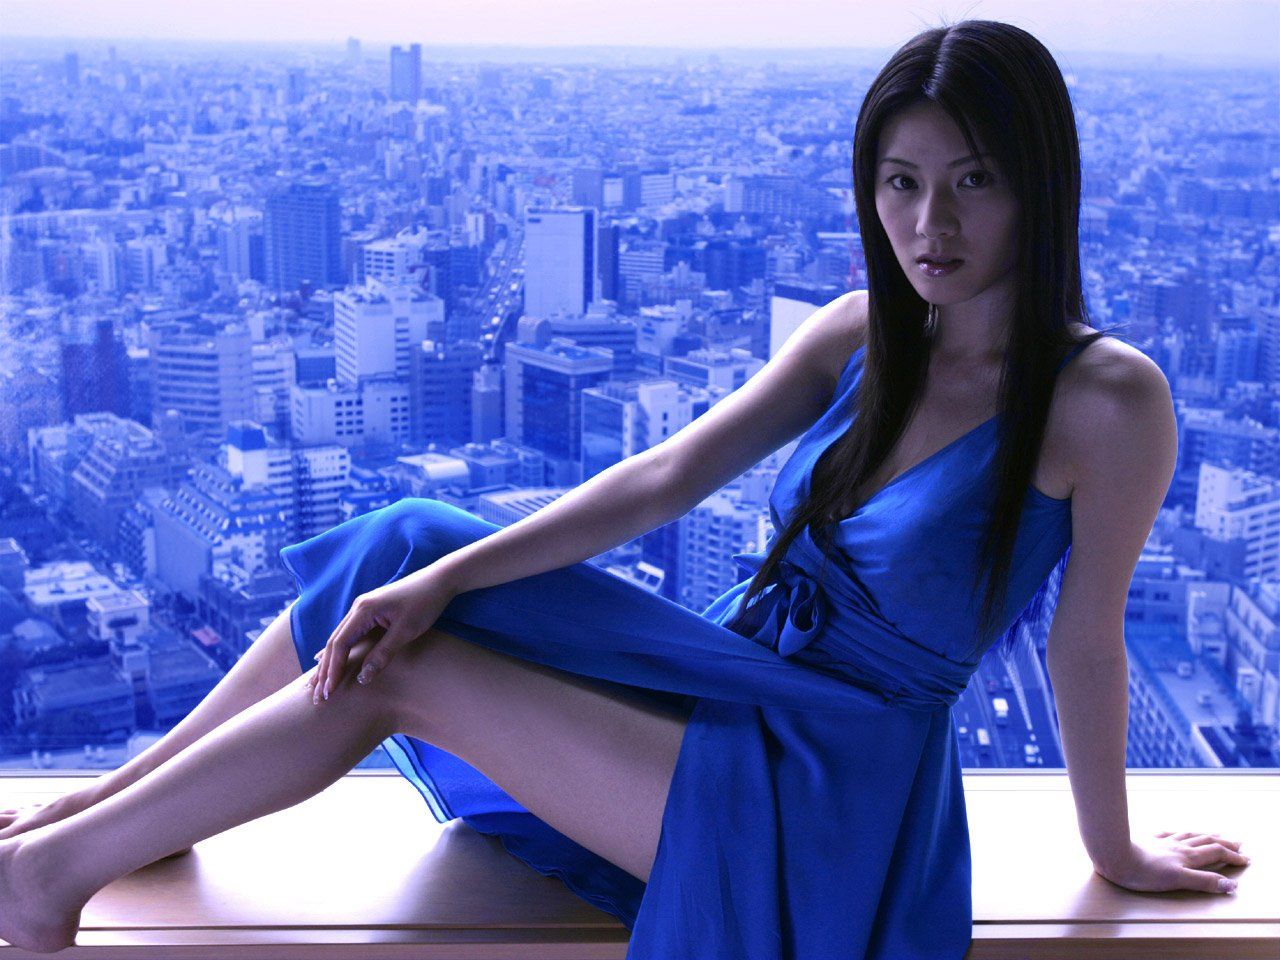 http://4.bp.blogspot.com/-udSTXHxfq8M/TZjuhO_FNtI/AAAAAAAAAIA/j-H2iEMi84A/s1600/Chinese_Beauty_10303_1280_960.jpg